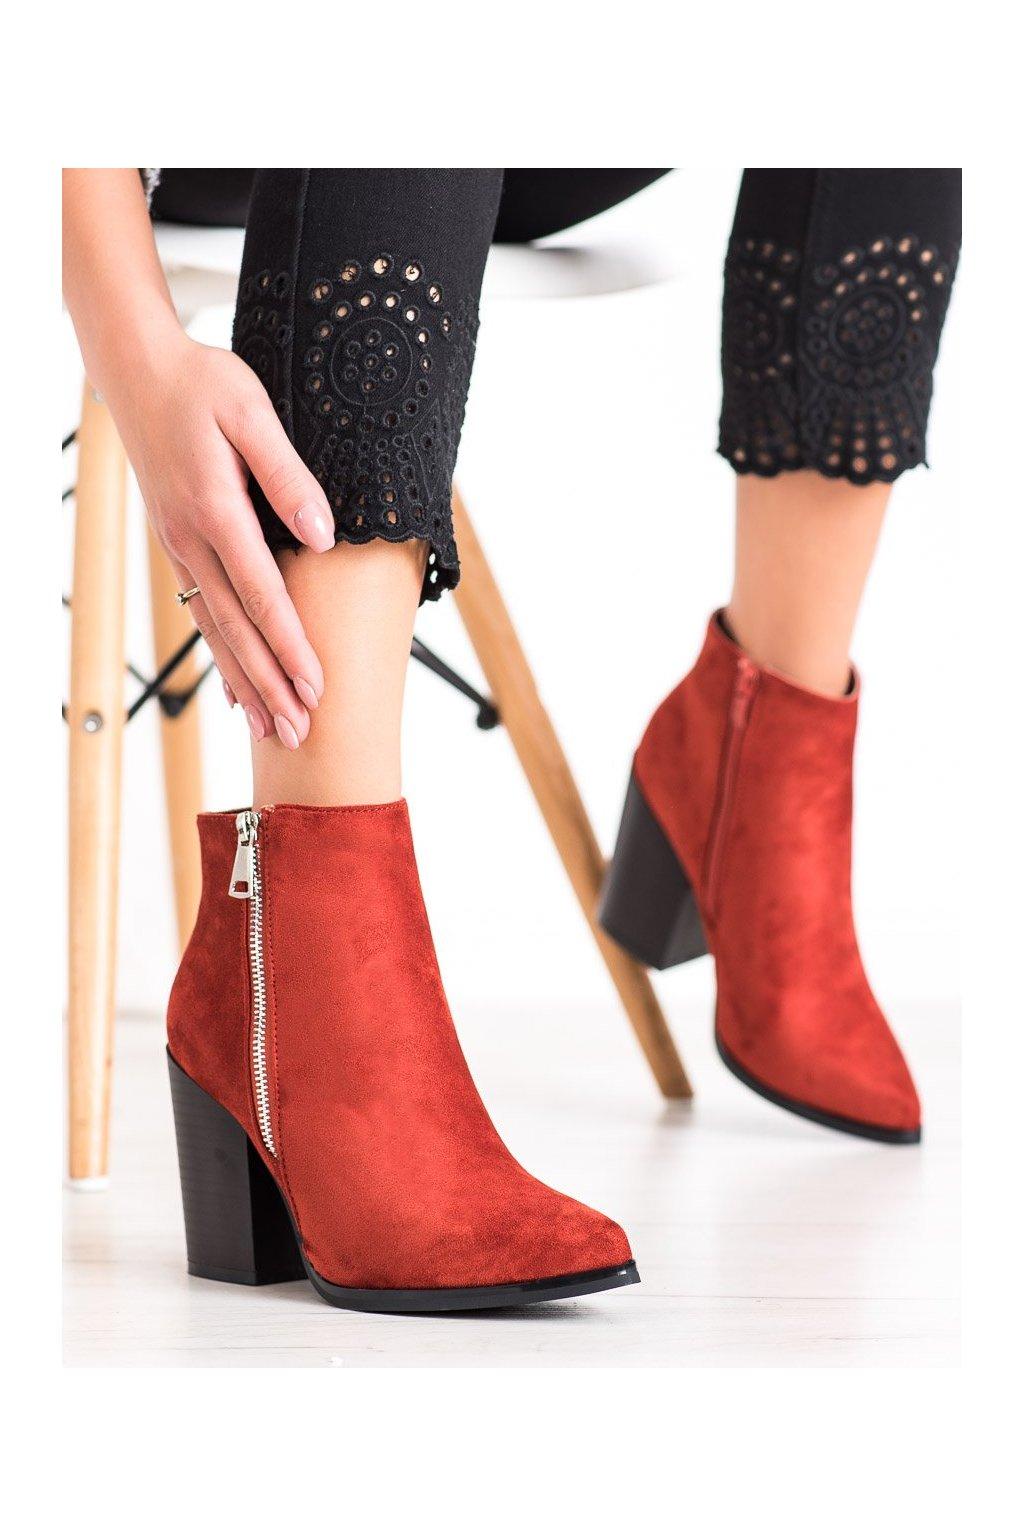 Oranžové dámske topánky Marquiz kod TX-1873OR